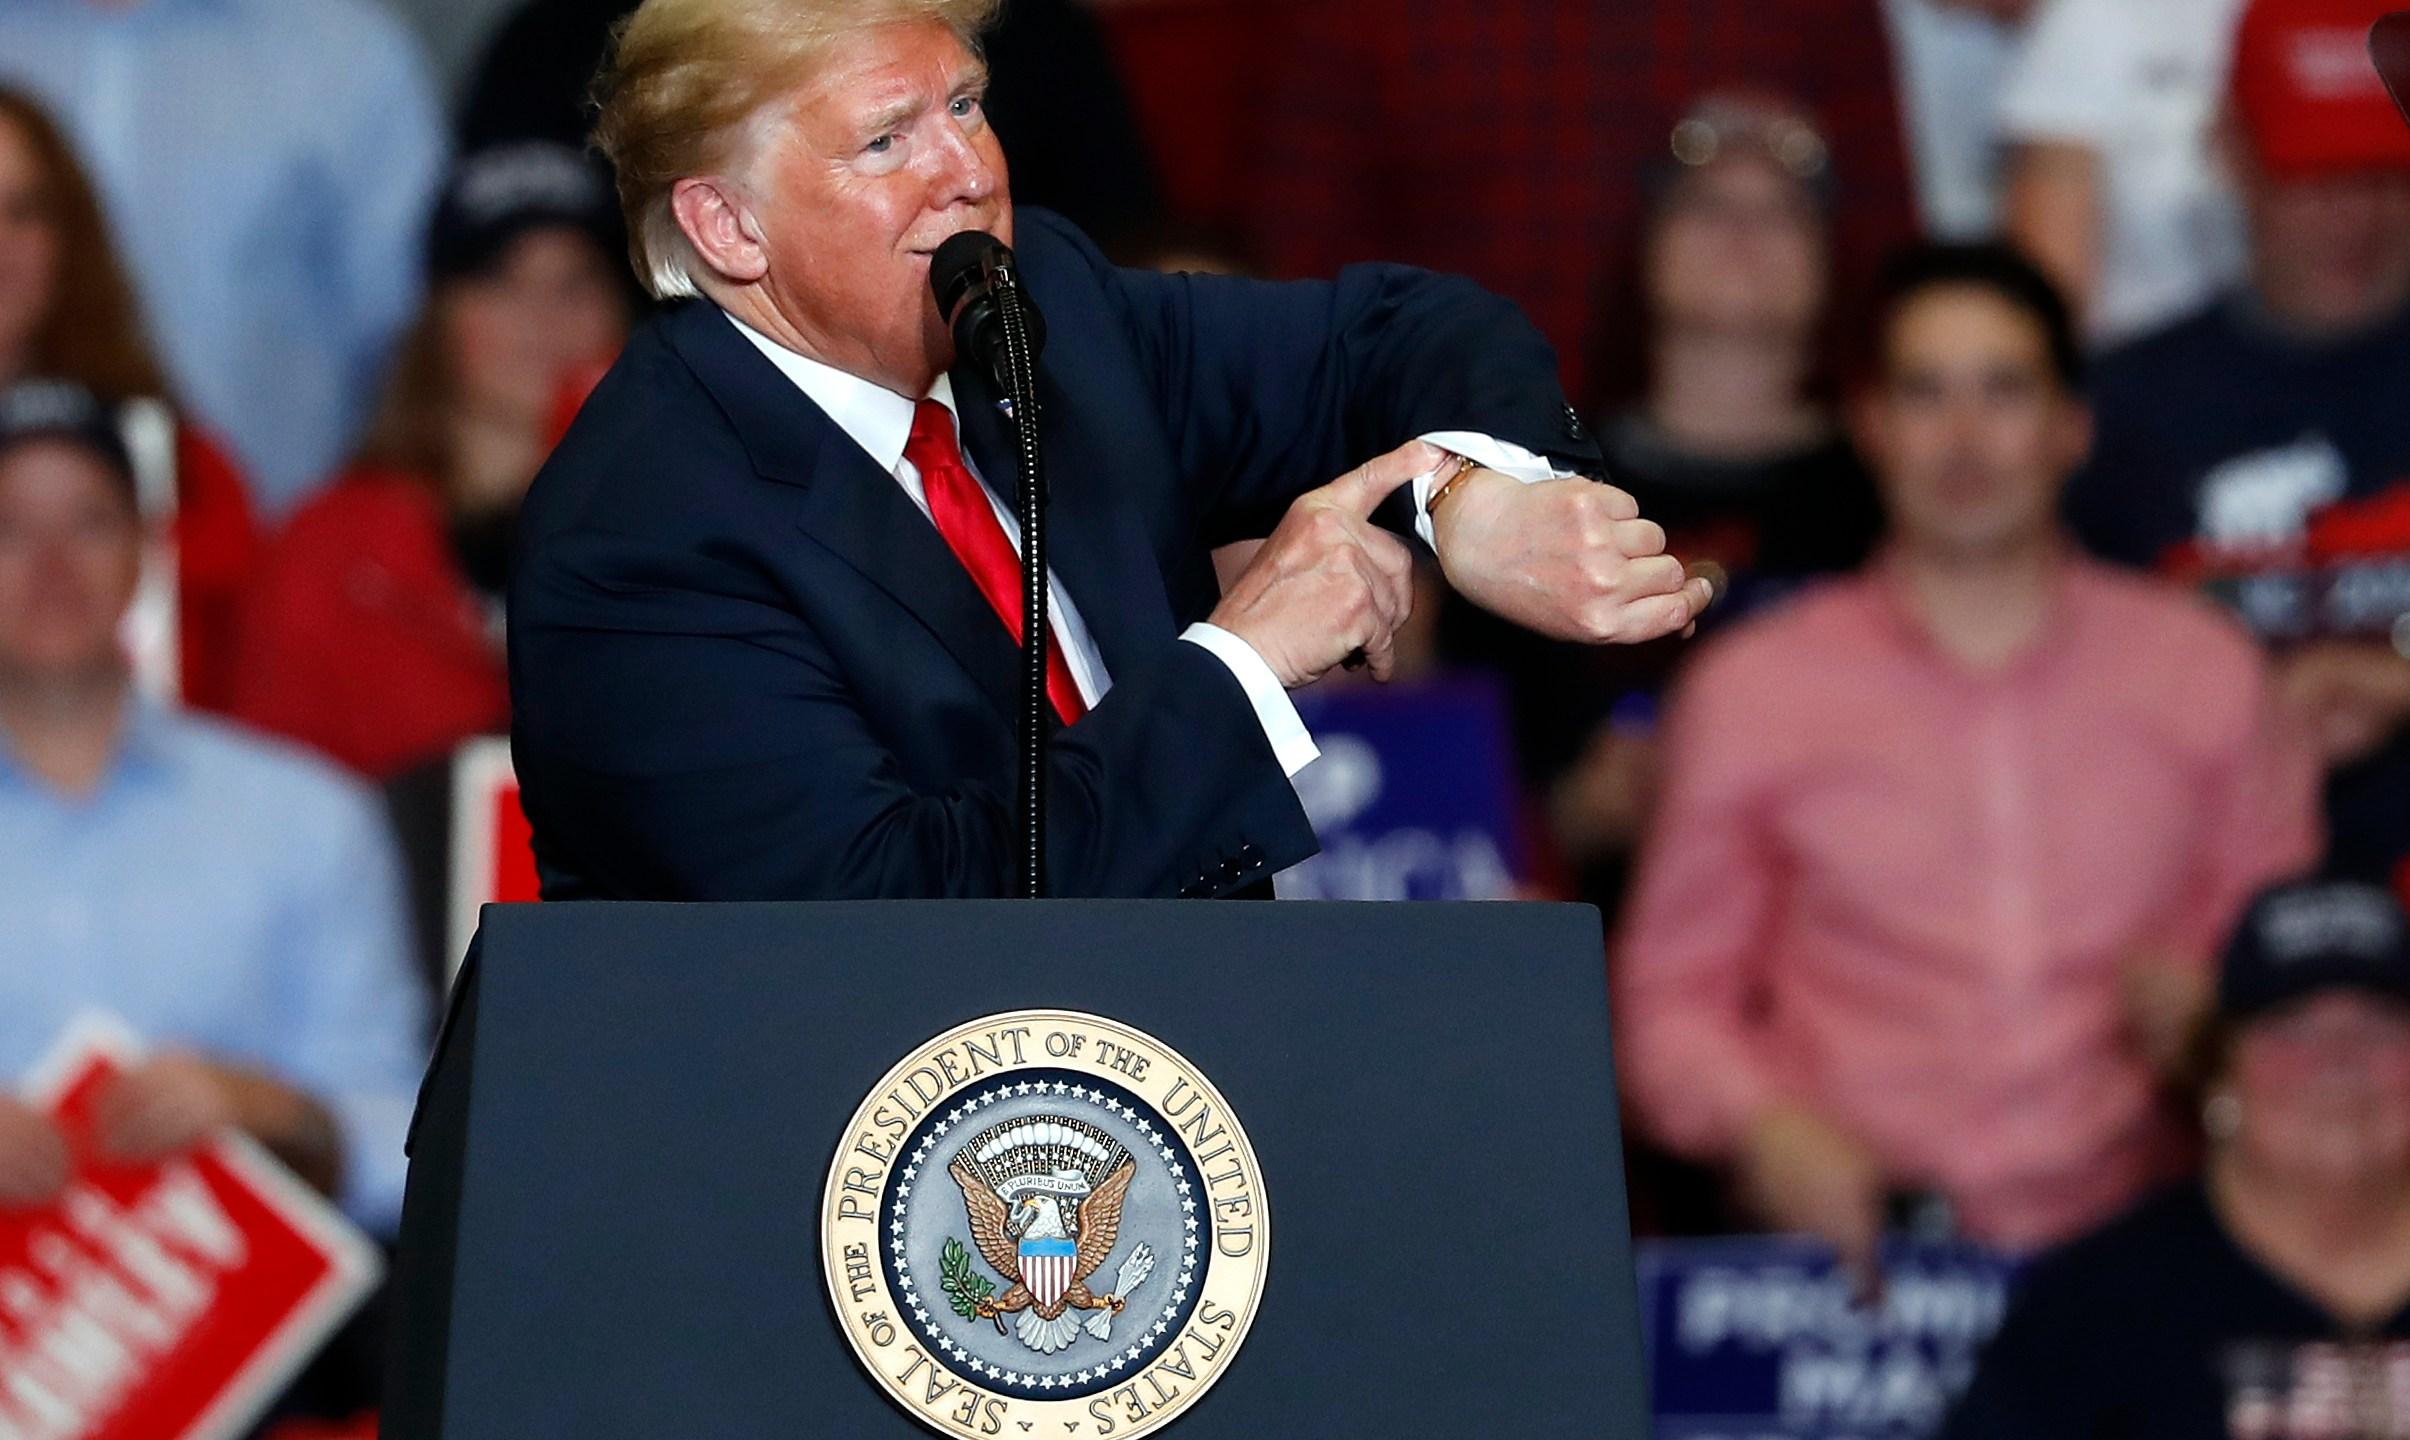 Election_2018_Trump_87425-159532.jpg09174559